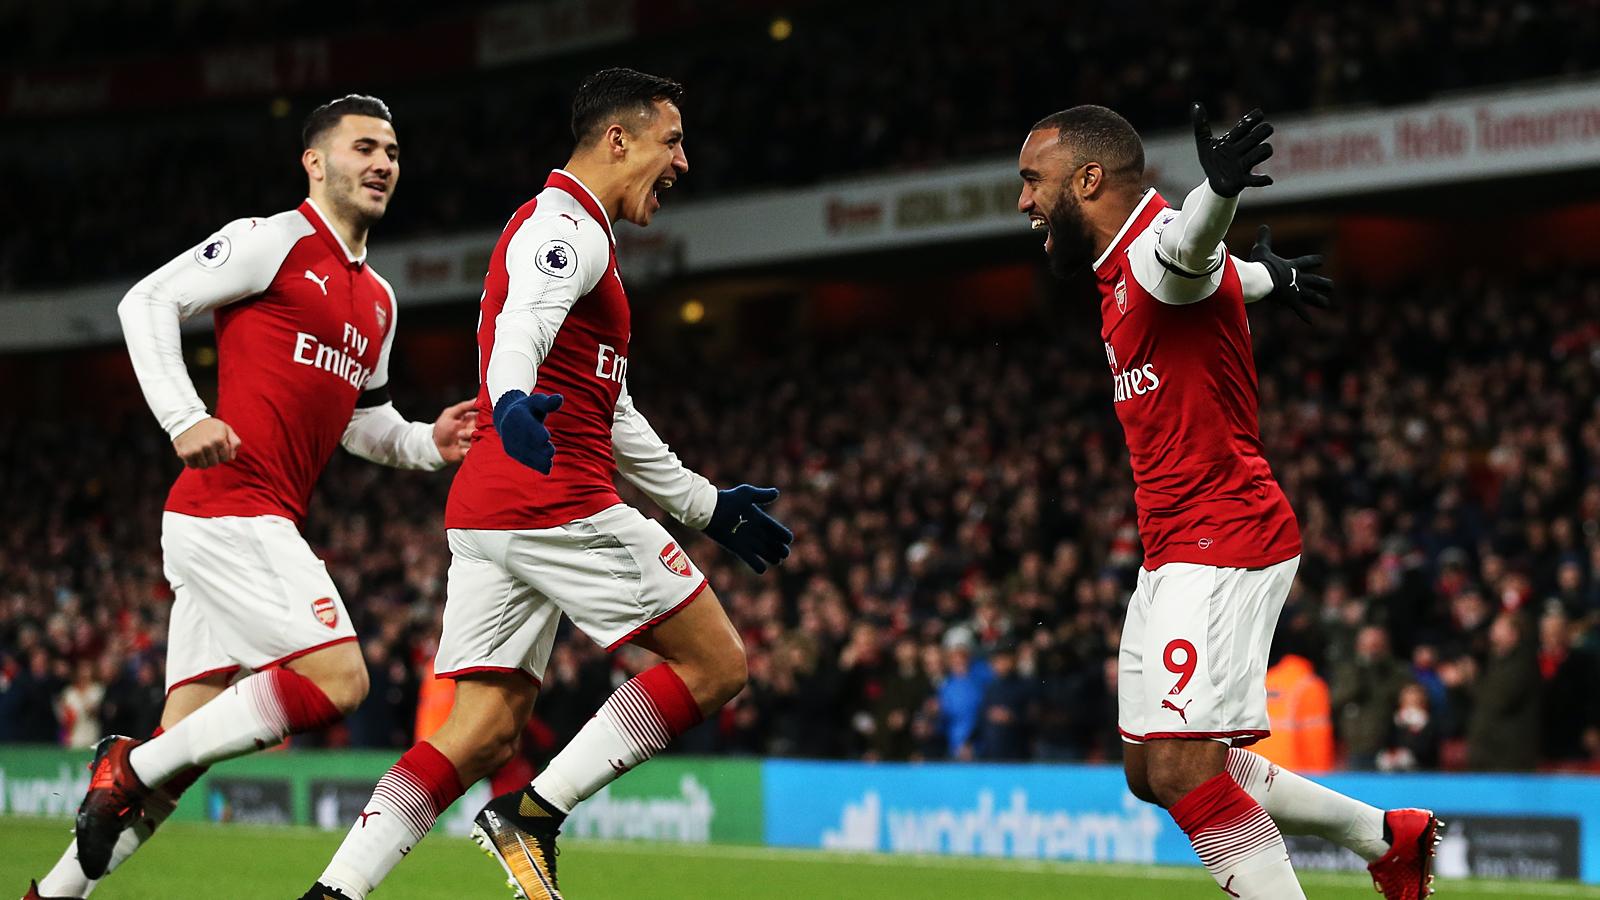 Huddersfield Vs Arsenal: Arsenal 5 - 0 Huddersfield Town - Match Report